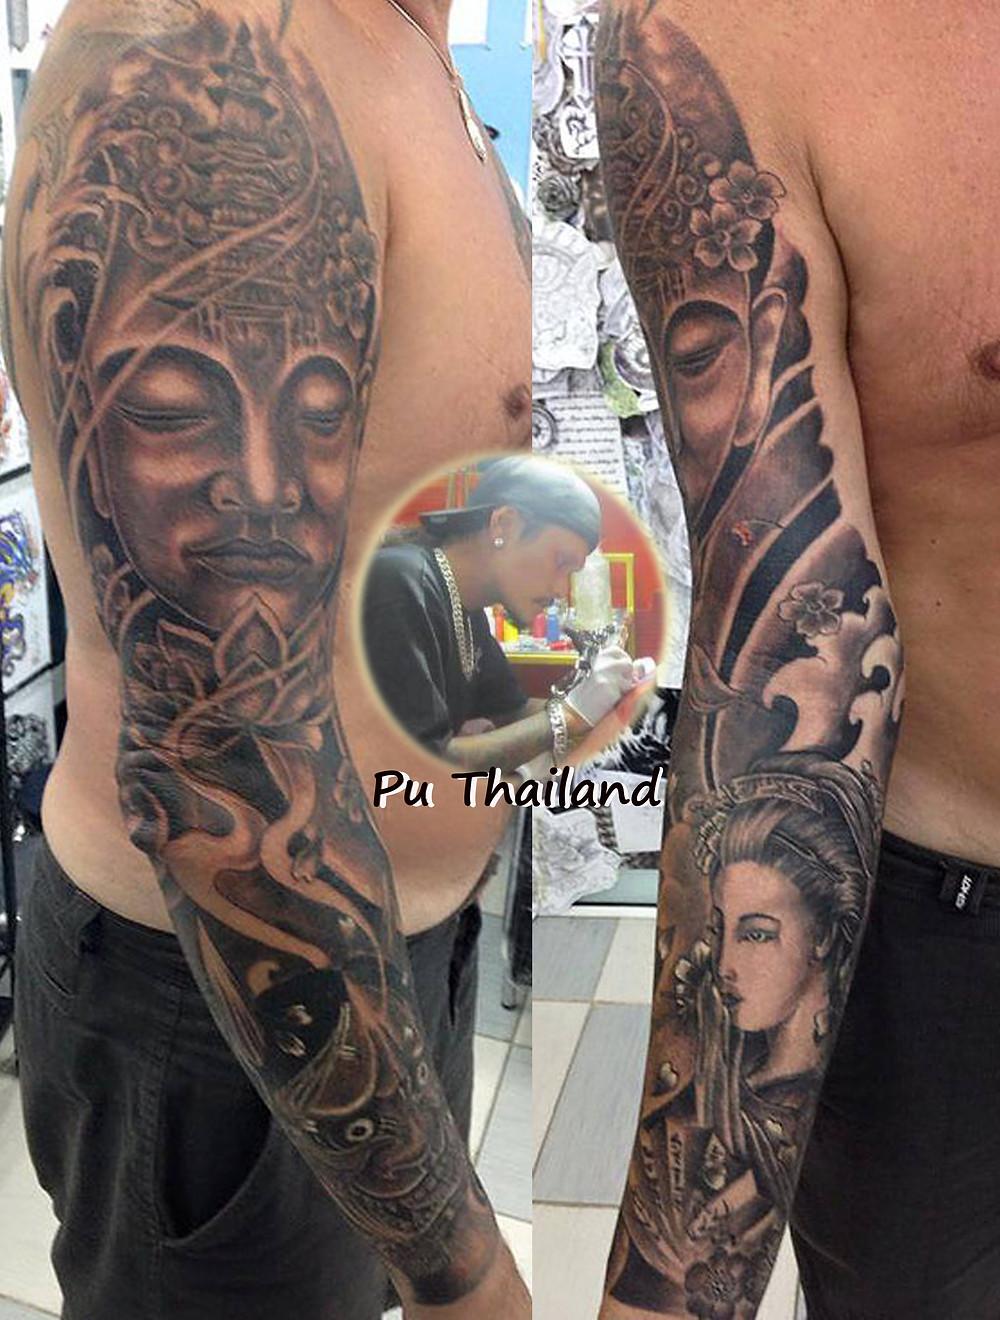 Japanese sleeve tattoo by Pu Thailand